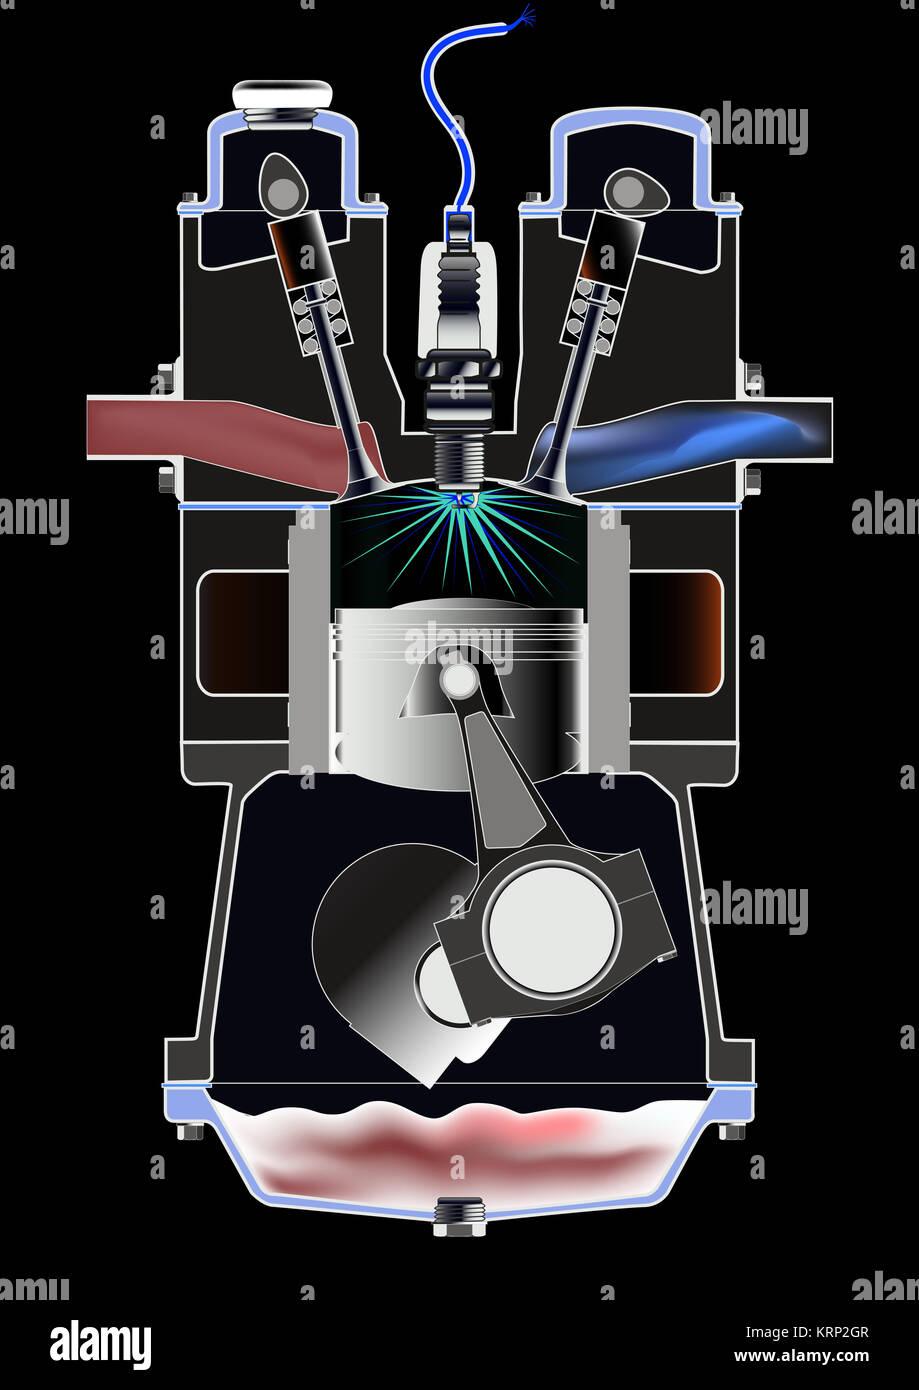 Engine Cutaway Stockfotos Bilder Seite 2 Alamy Diagram Viertakt Benzinmotor Stockbild